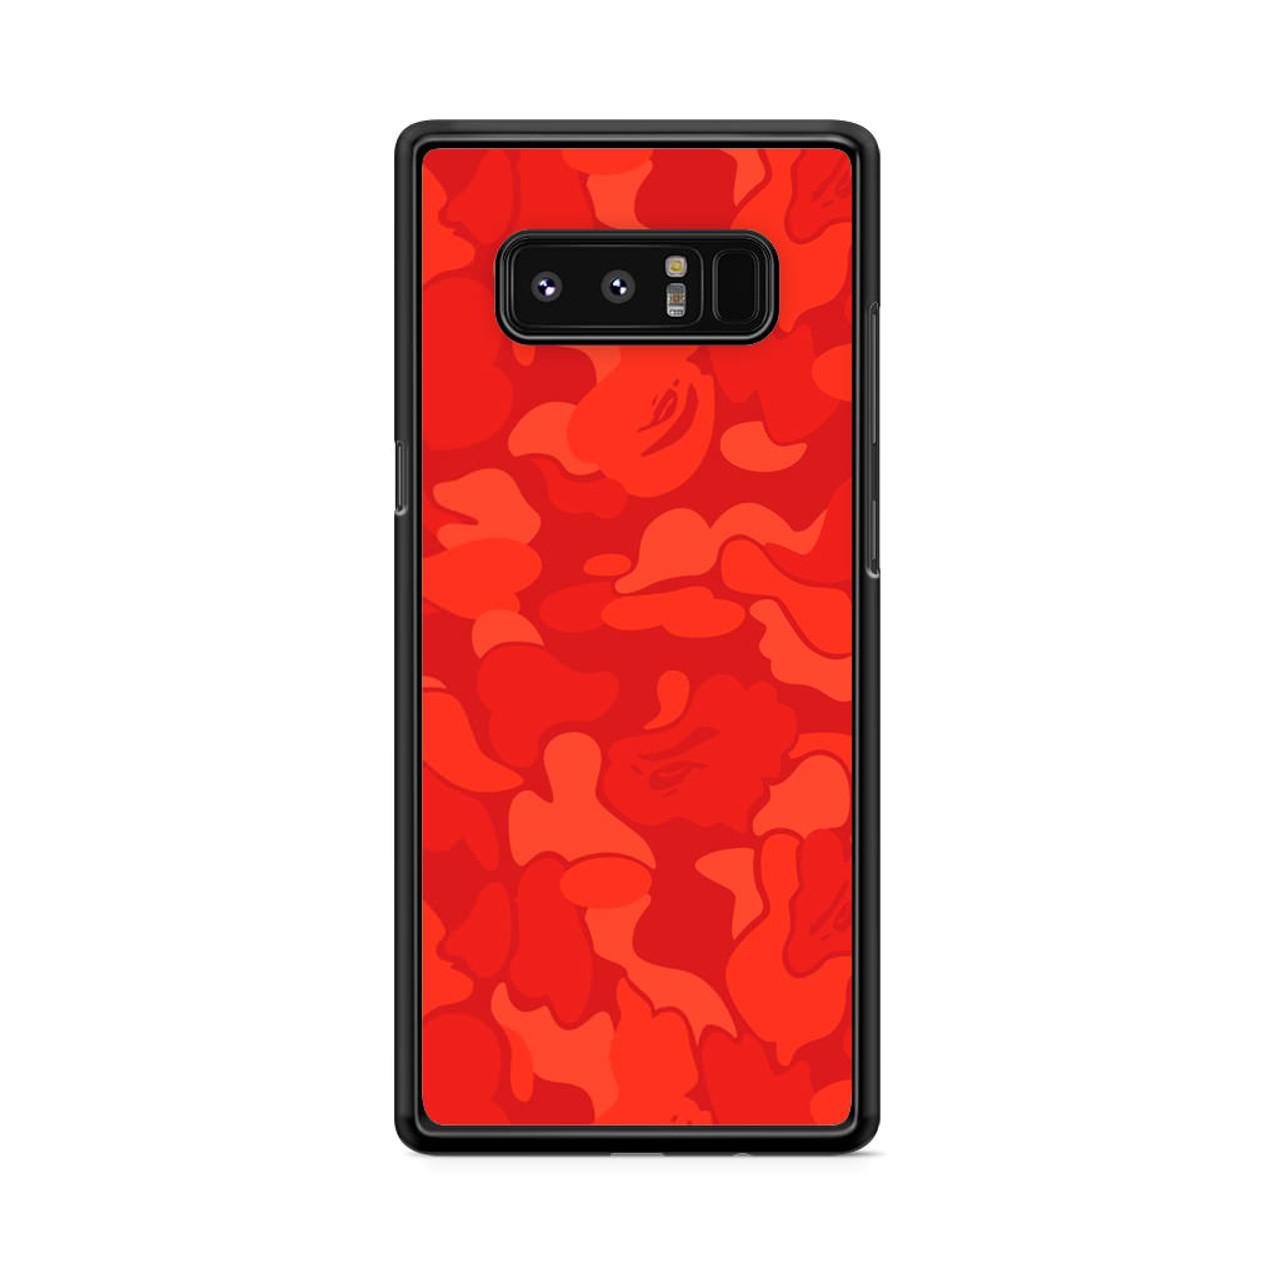 size 40 884d1 c1633 Bape Camo Red Samsung Galaxy Note 8 Case